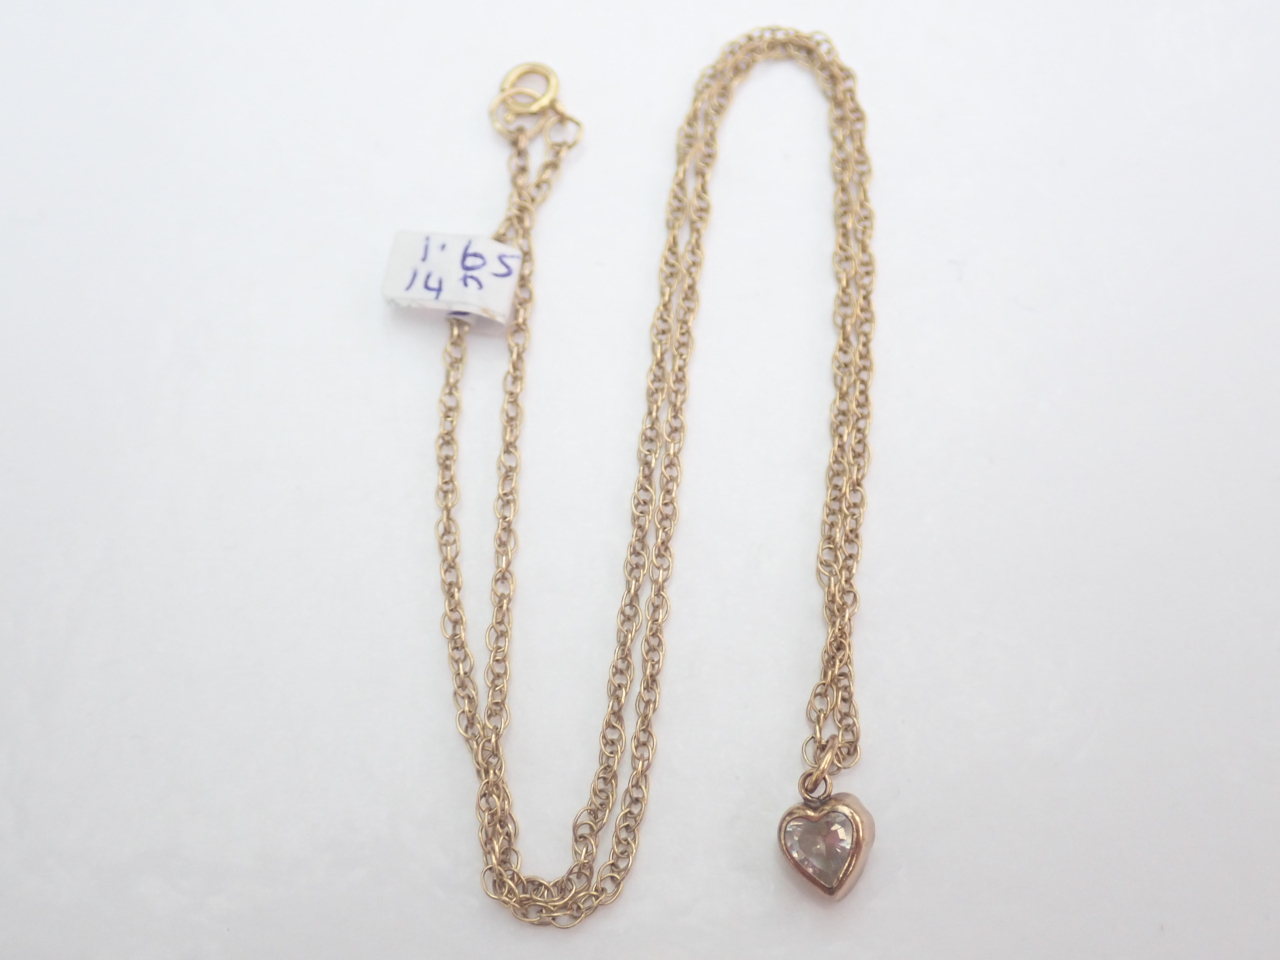 Cubic Zirconia Heart Pendant 375 9k - 14 inch 9k gold Chain